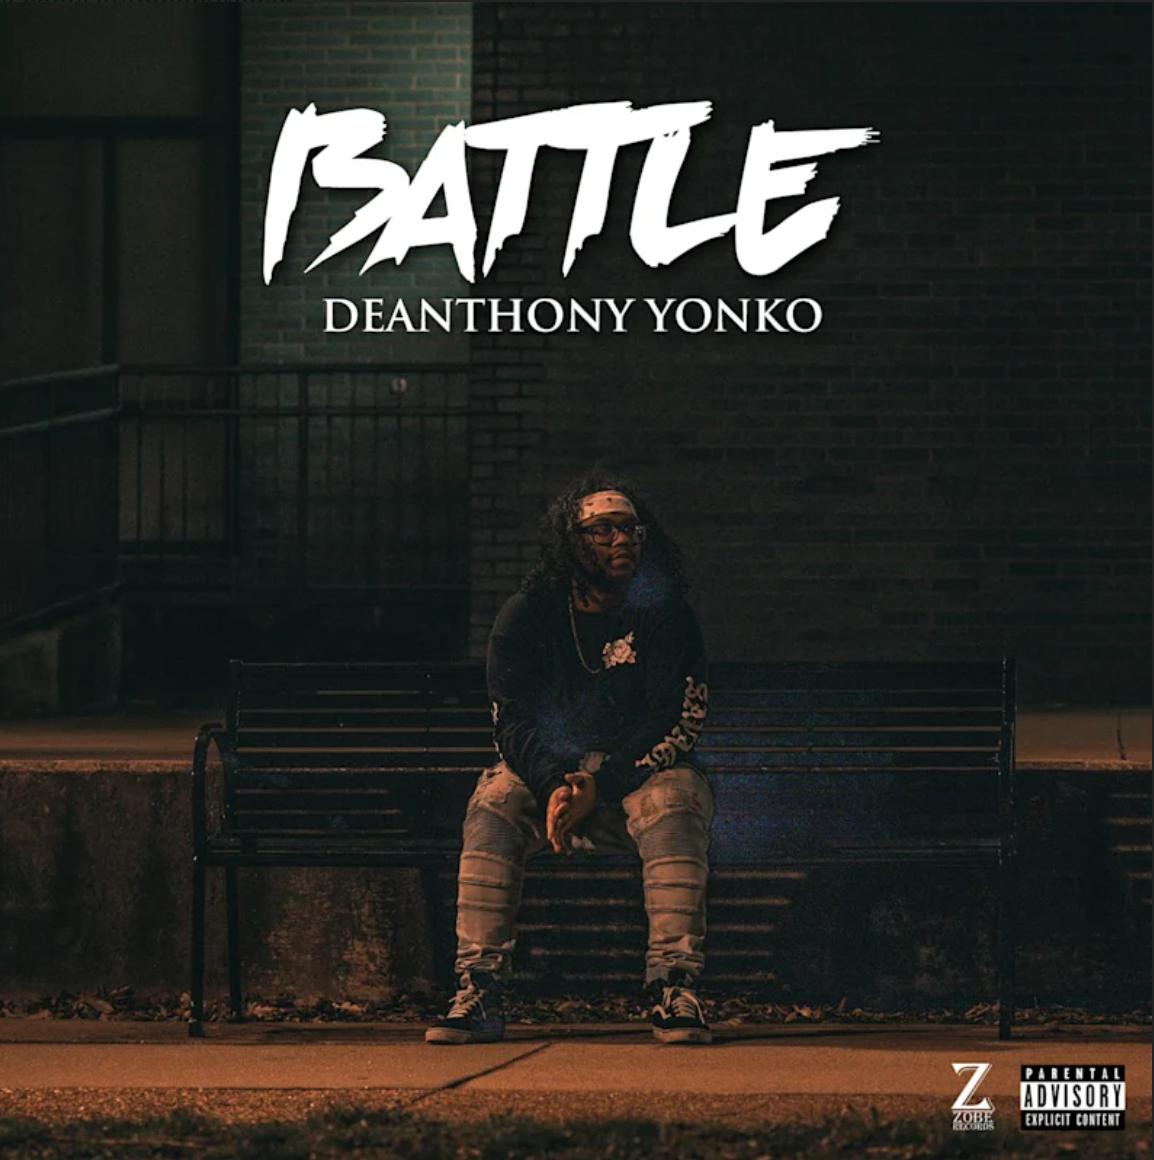 DeAnthony Yonko drops his debut album titled